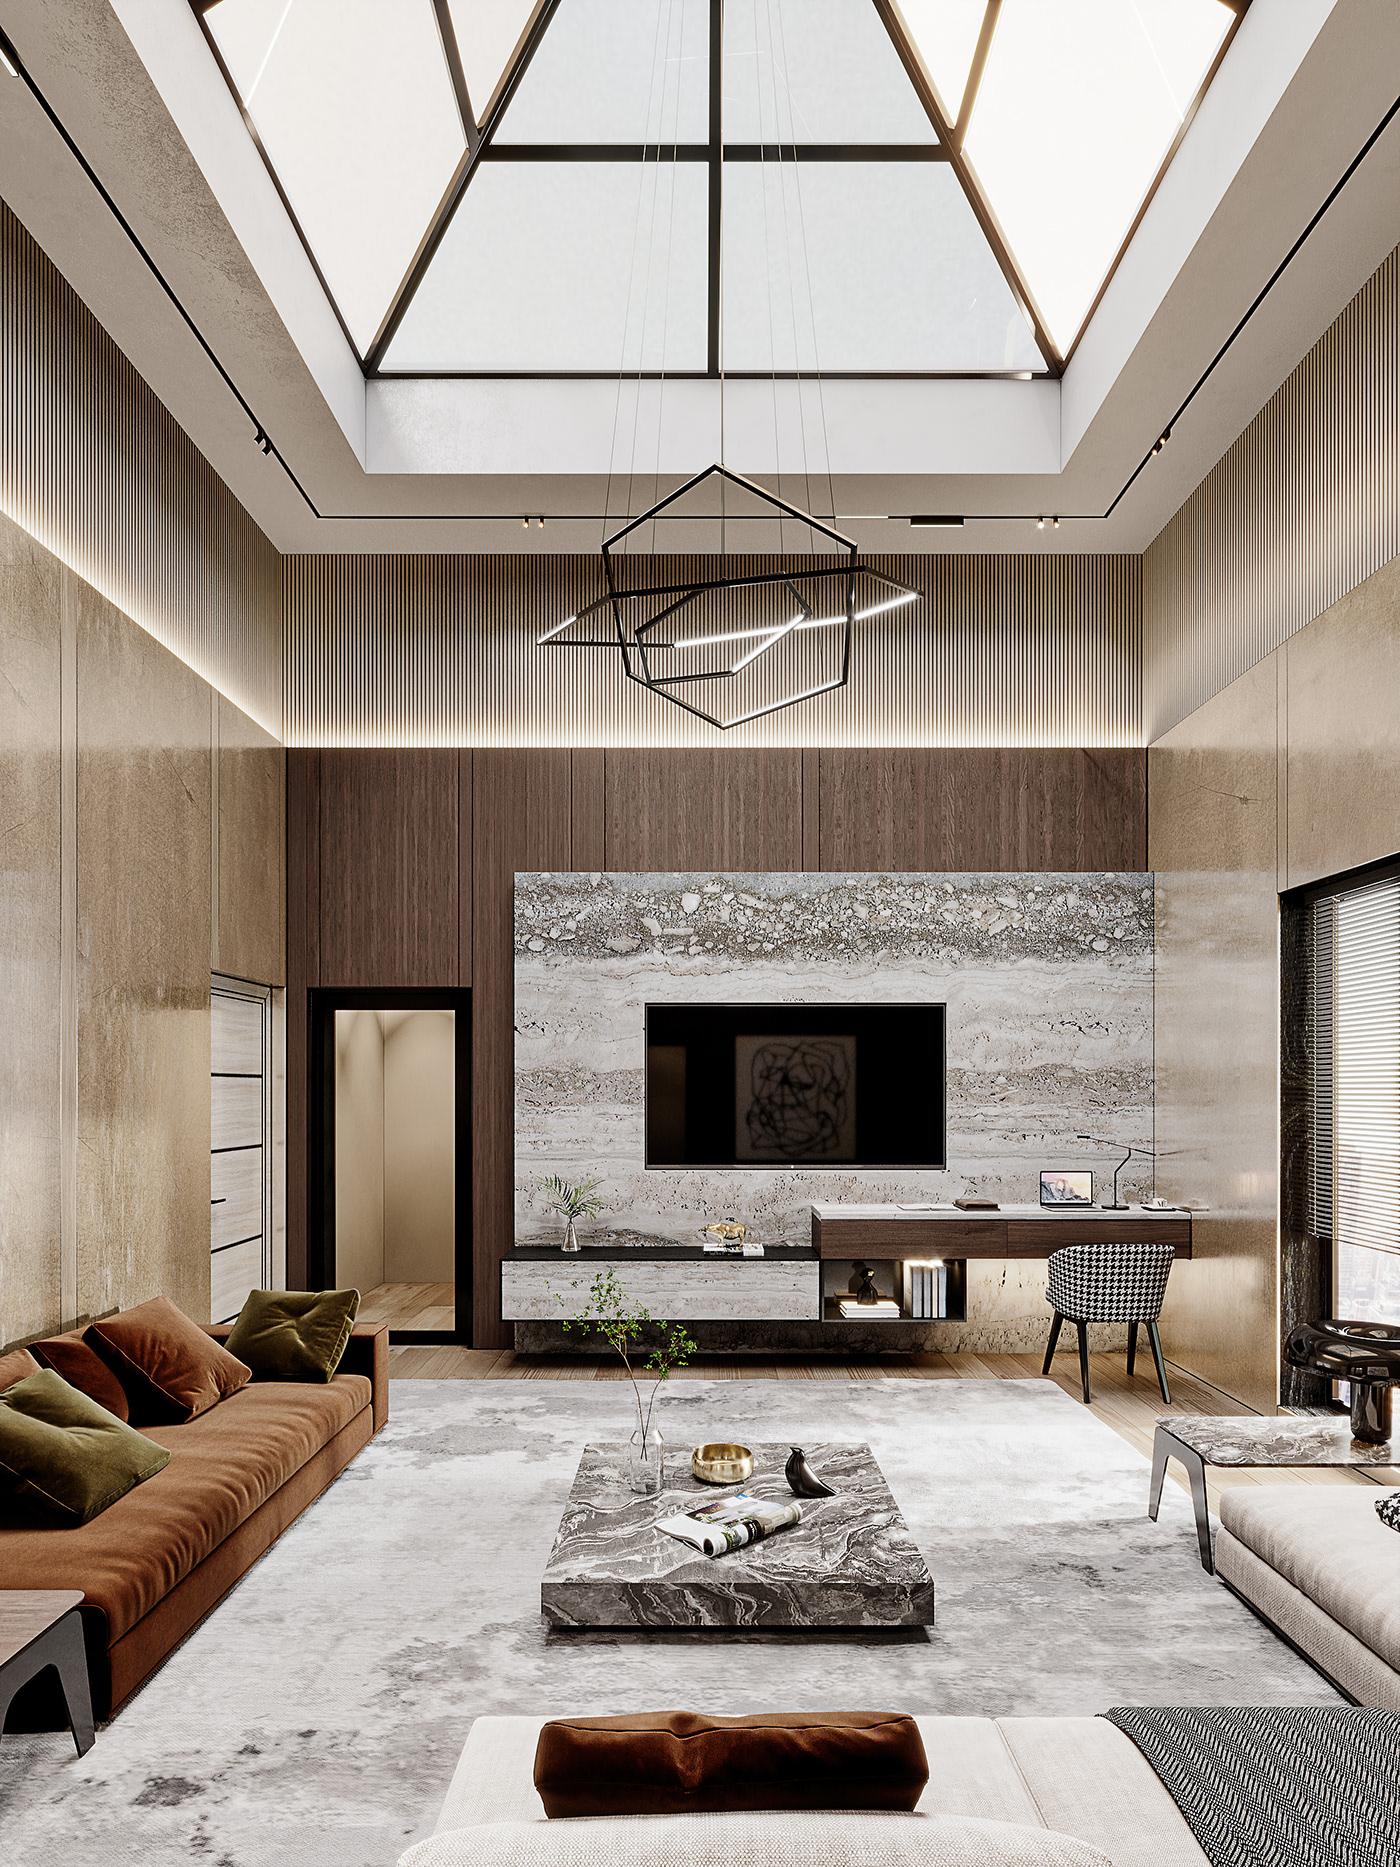 3dmax Behance CGI CoronaRender  design free Interior living Render visualization